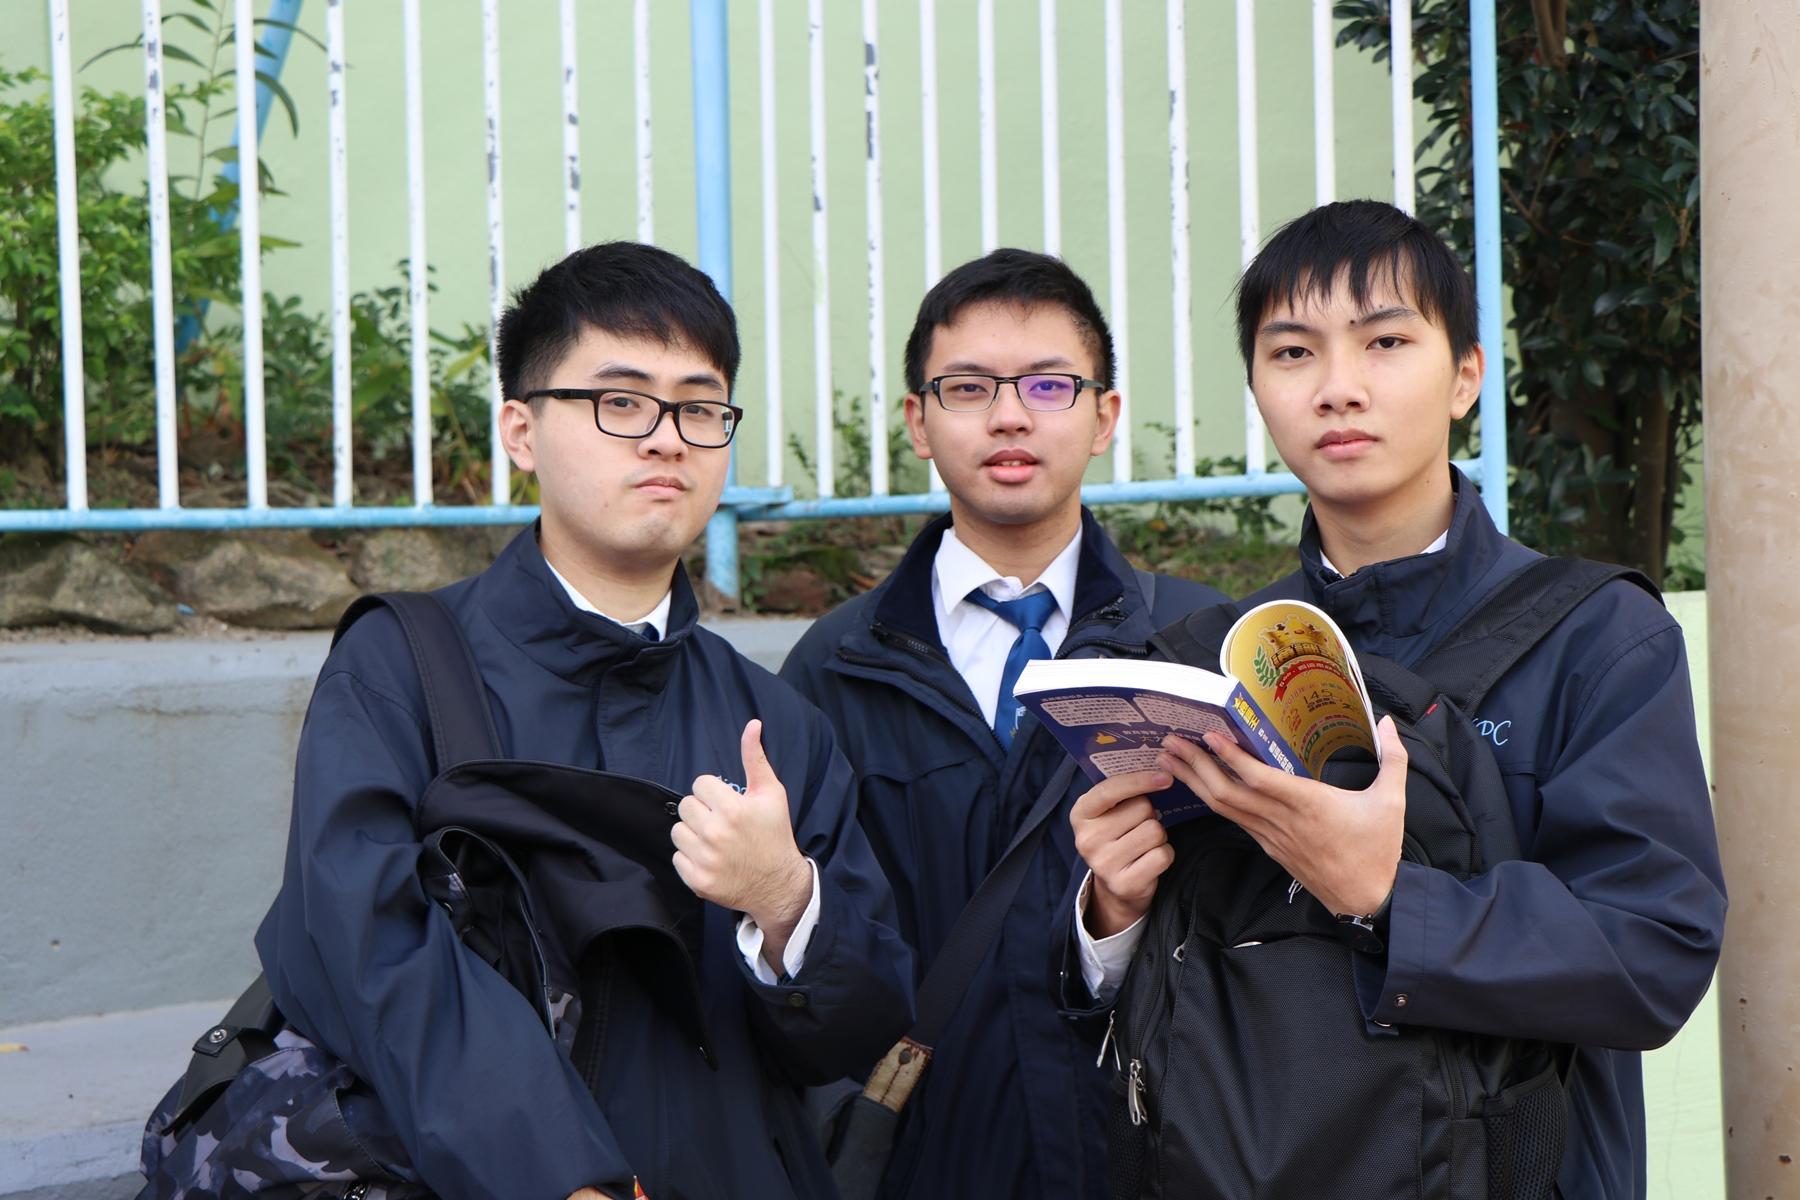 https://npc.edu.hk/sites/default/files/07_9.jpg